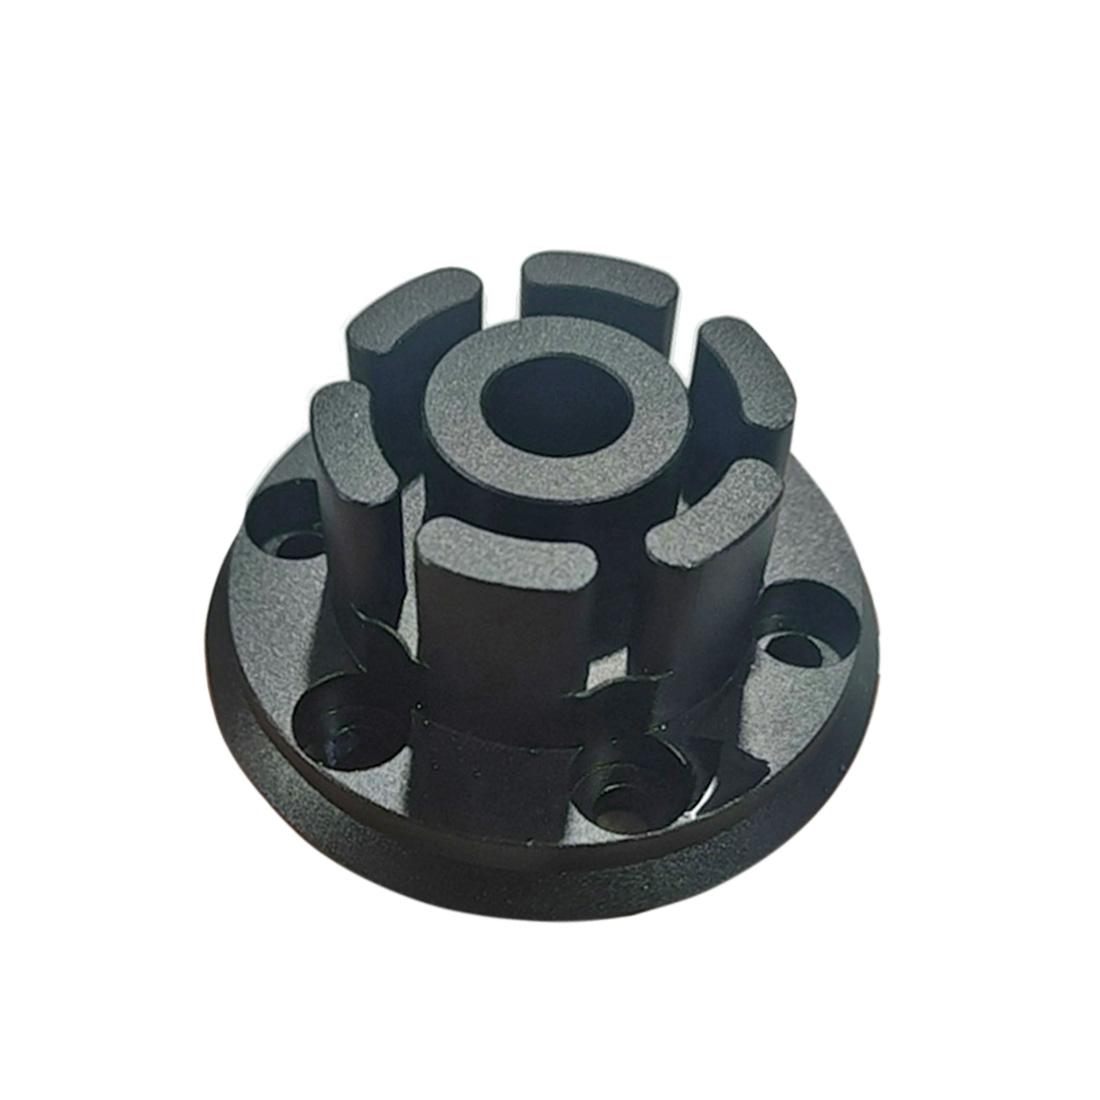 2 Pcs CNC Adapter for ABEC Wheels